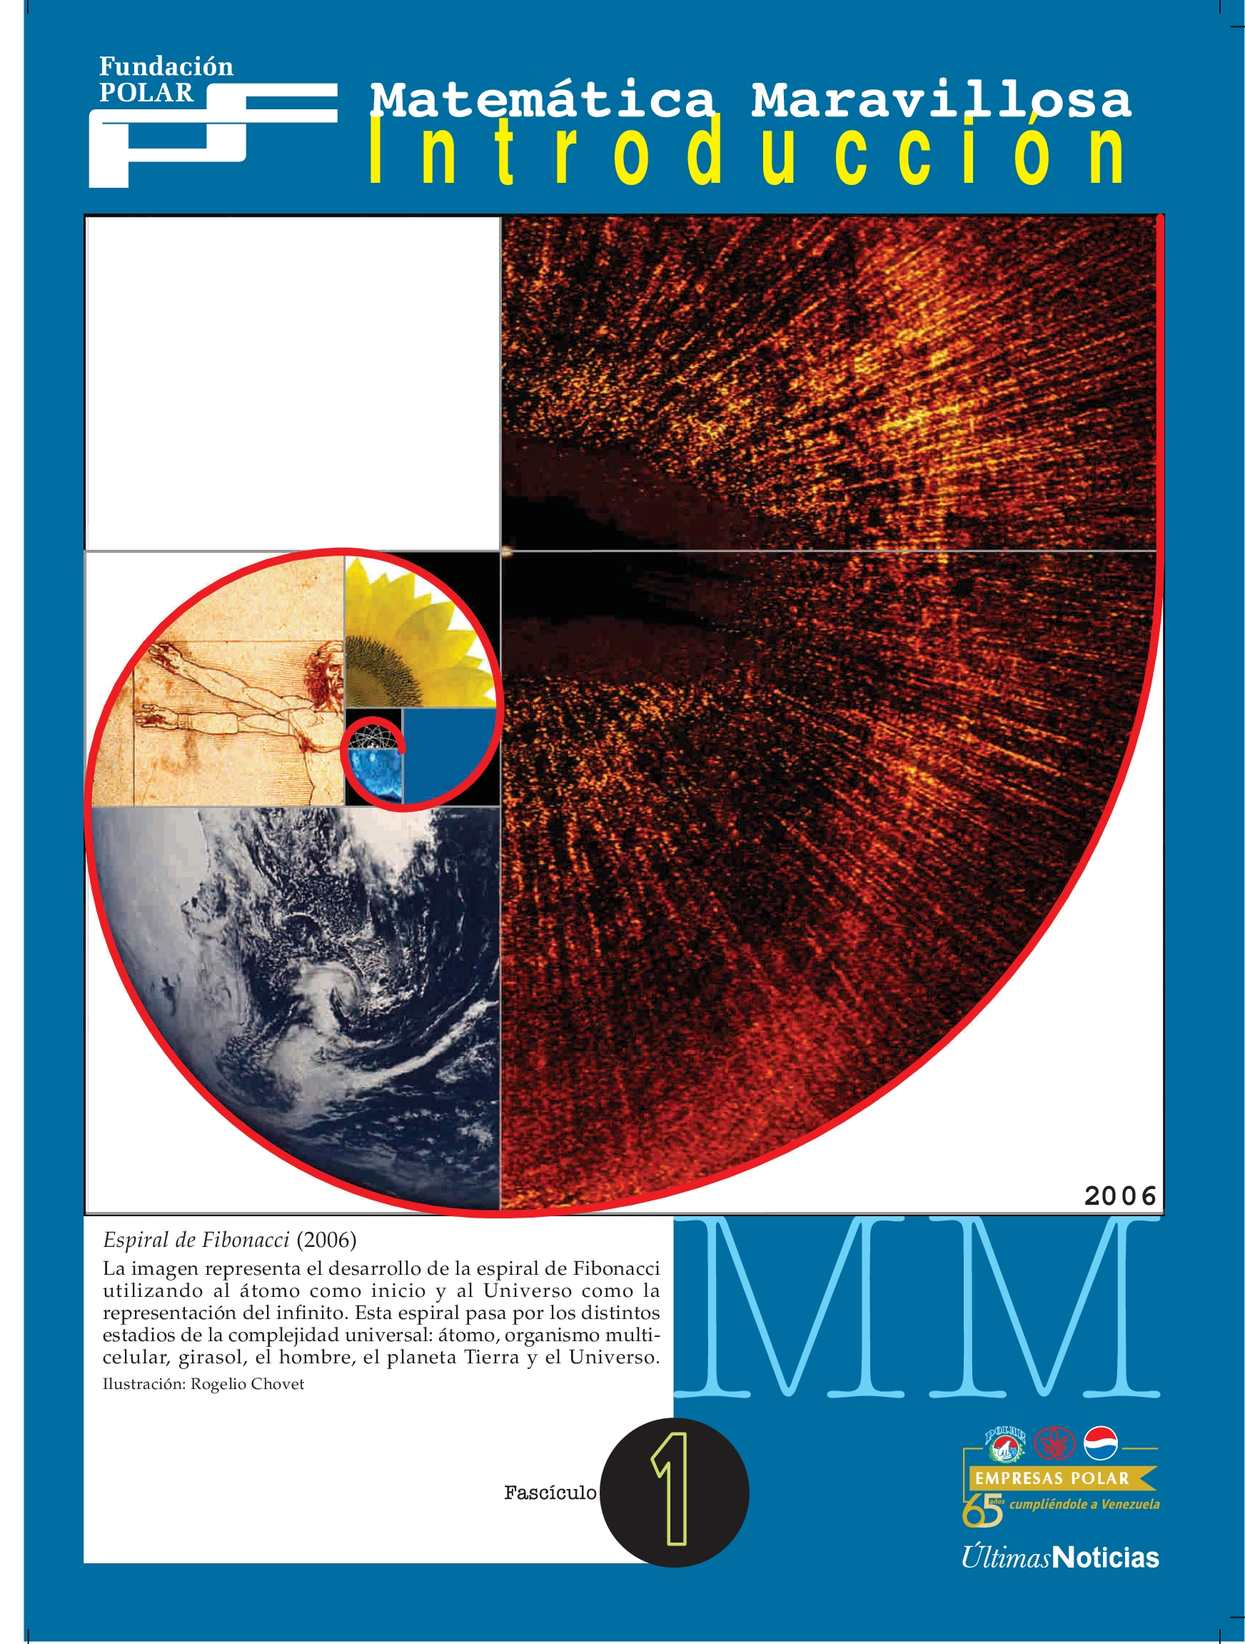 Fundacion Polar Matemáticas Maravillosas